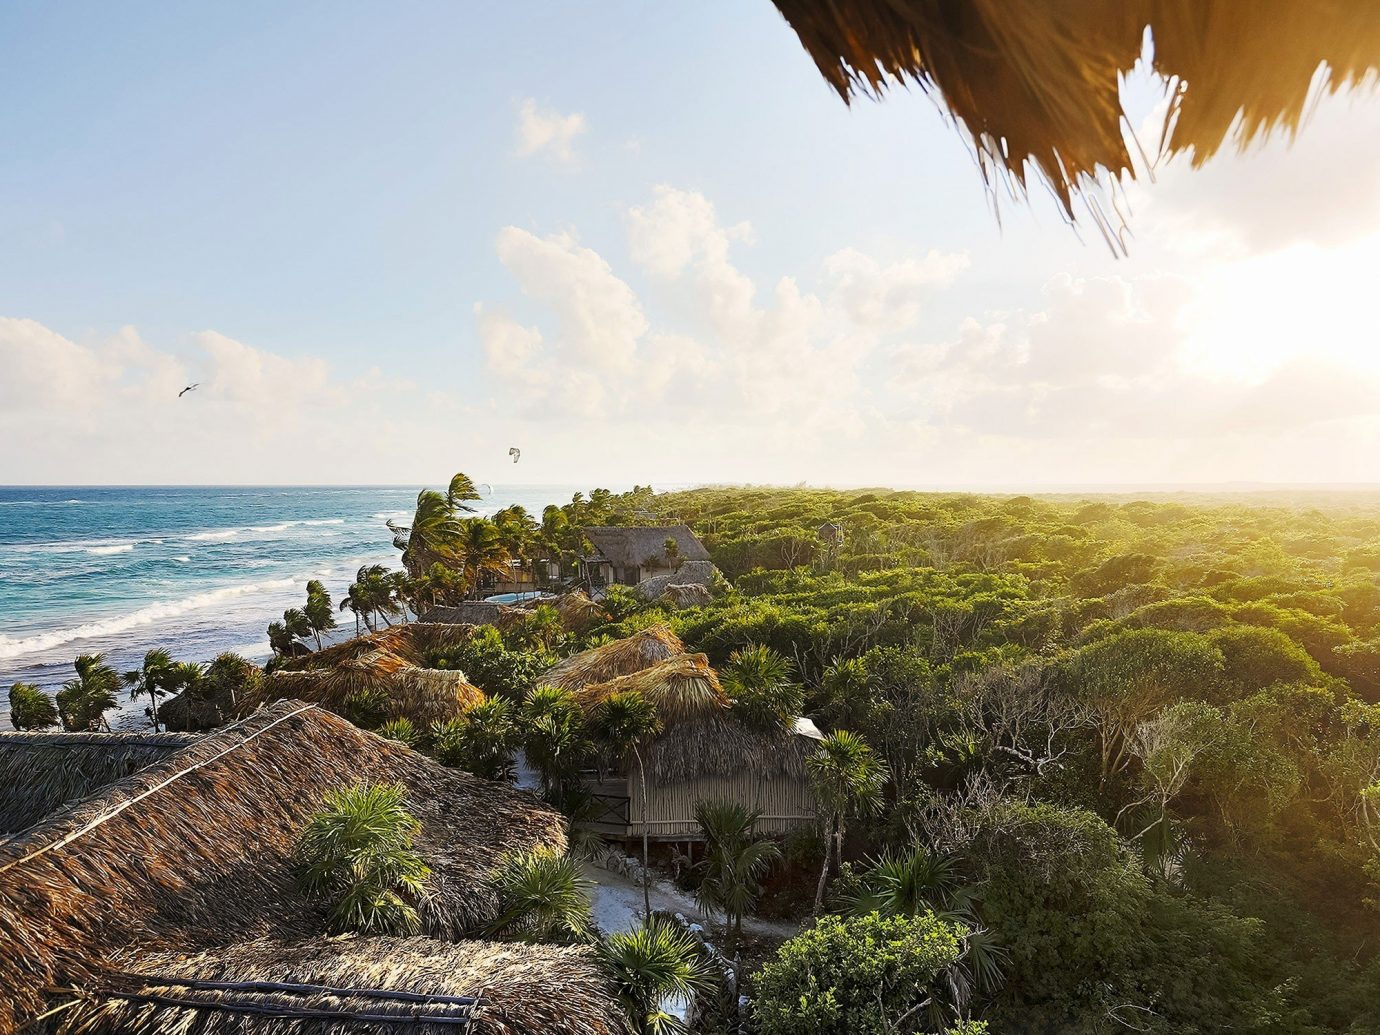 Hotels Trip Ideas outdoor sky Nature Sea Coast tree ecosystem horizon Ocean shore vacation morning sunlight landscape terrain cliff arecales